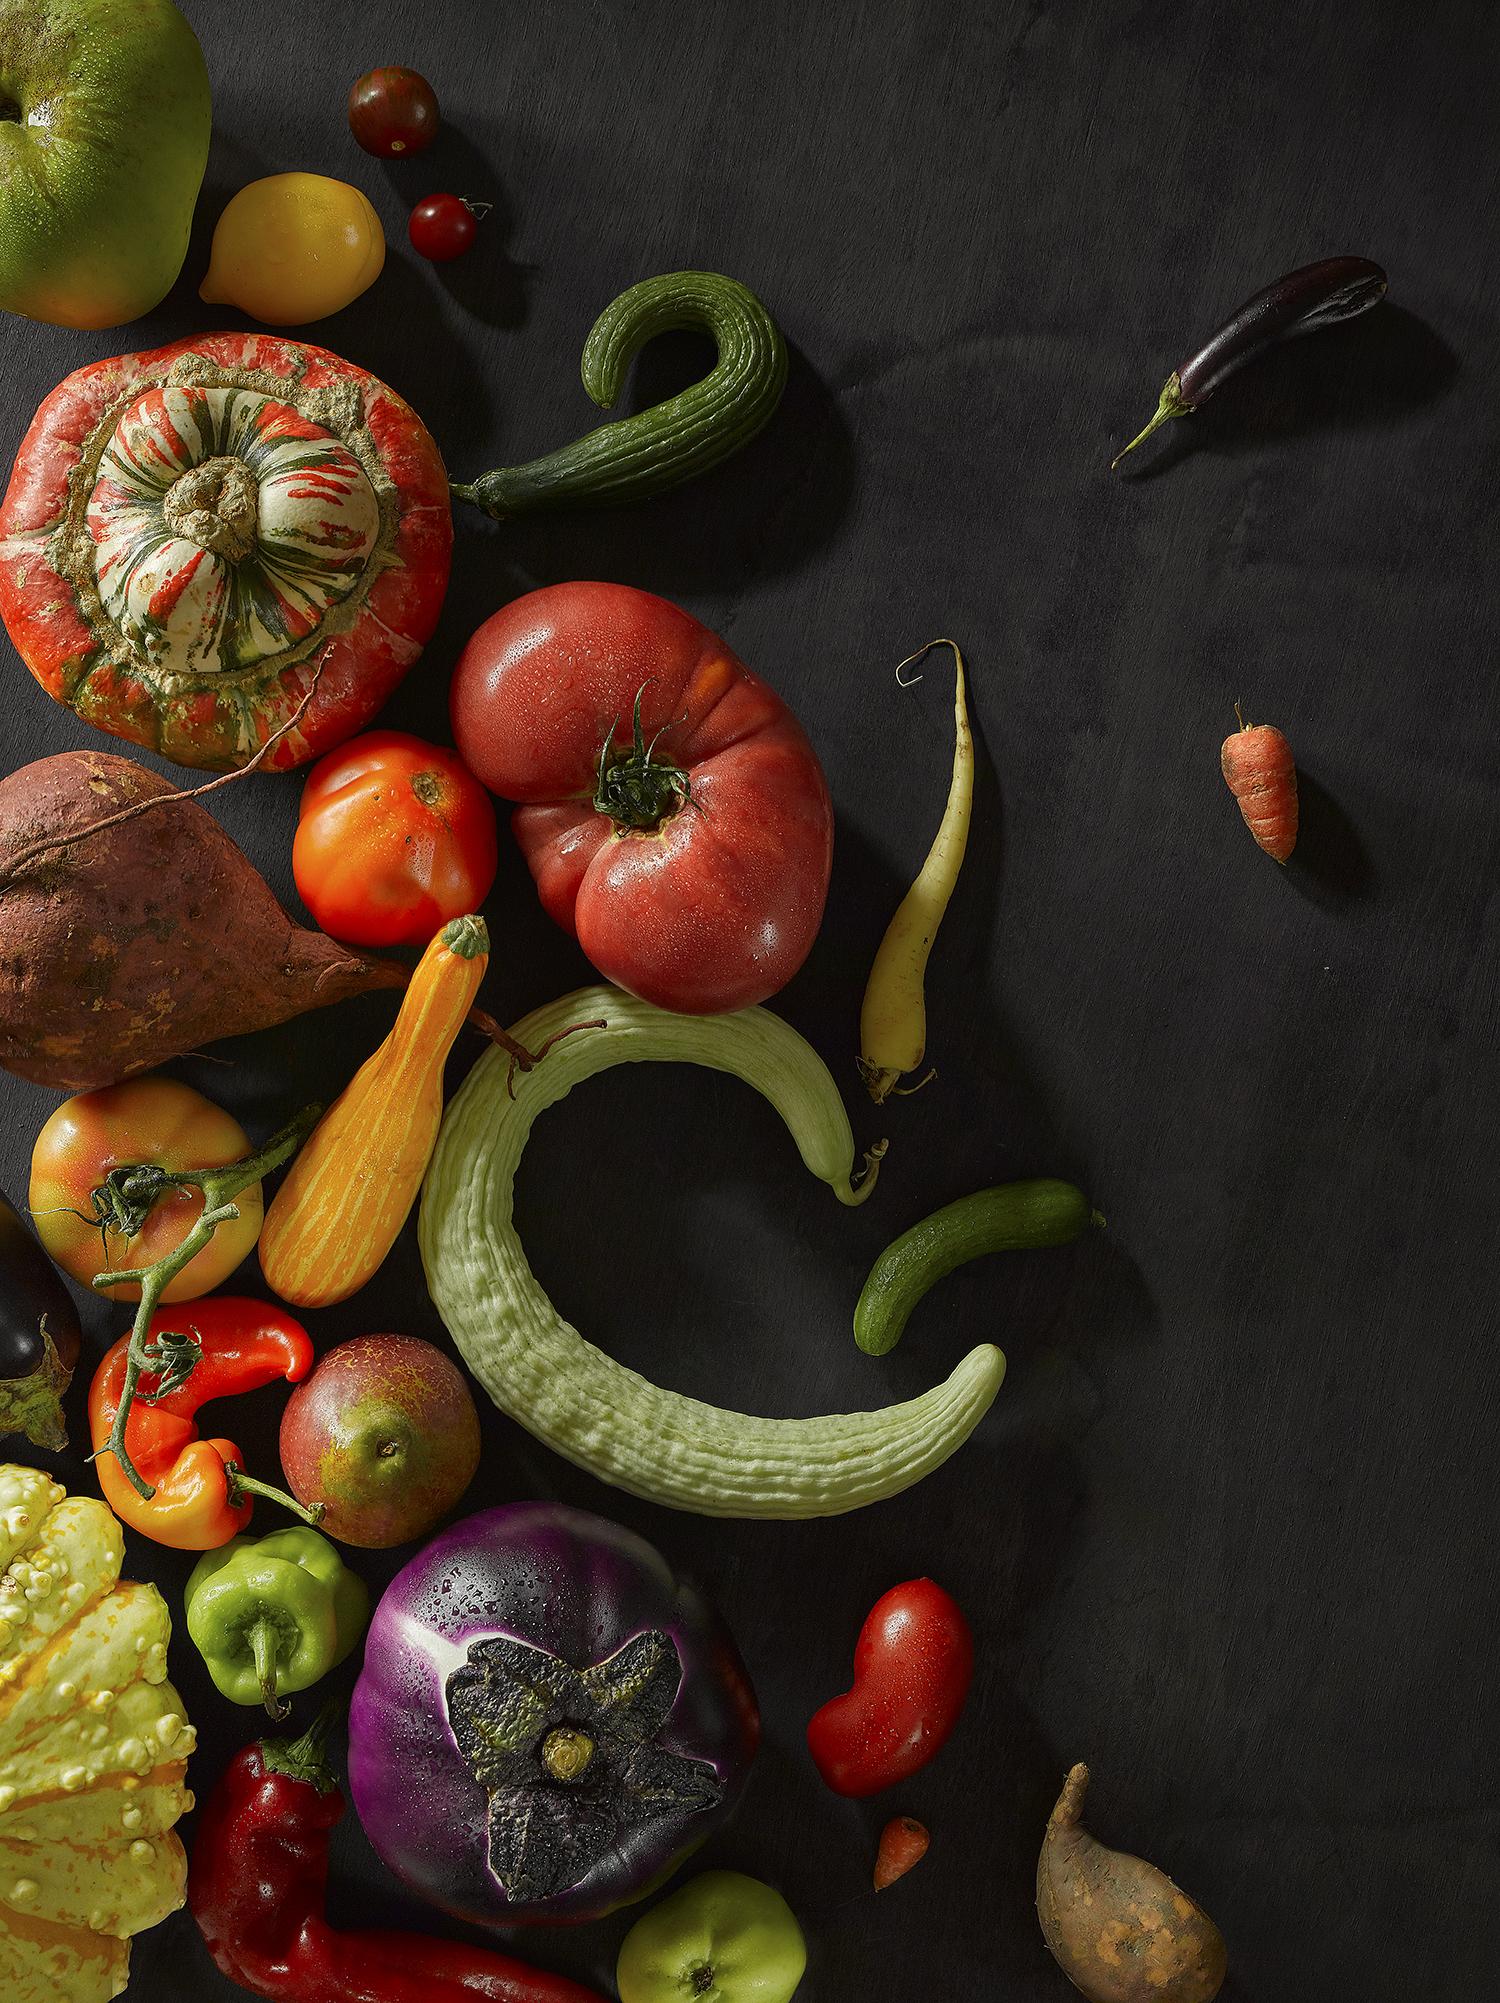 Still Life food photography. Mixed raw foods, fruit and veg on dark wood, autumnal feeling, food and lifestyle photography, London & Croydon food studio.